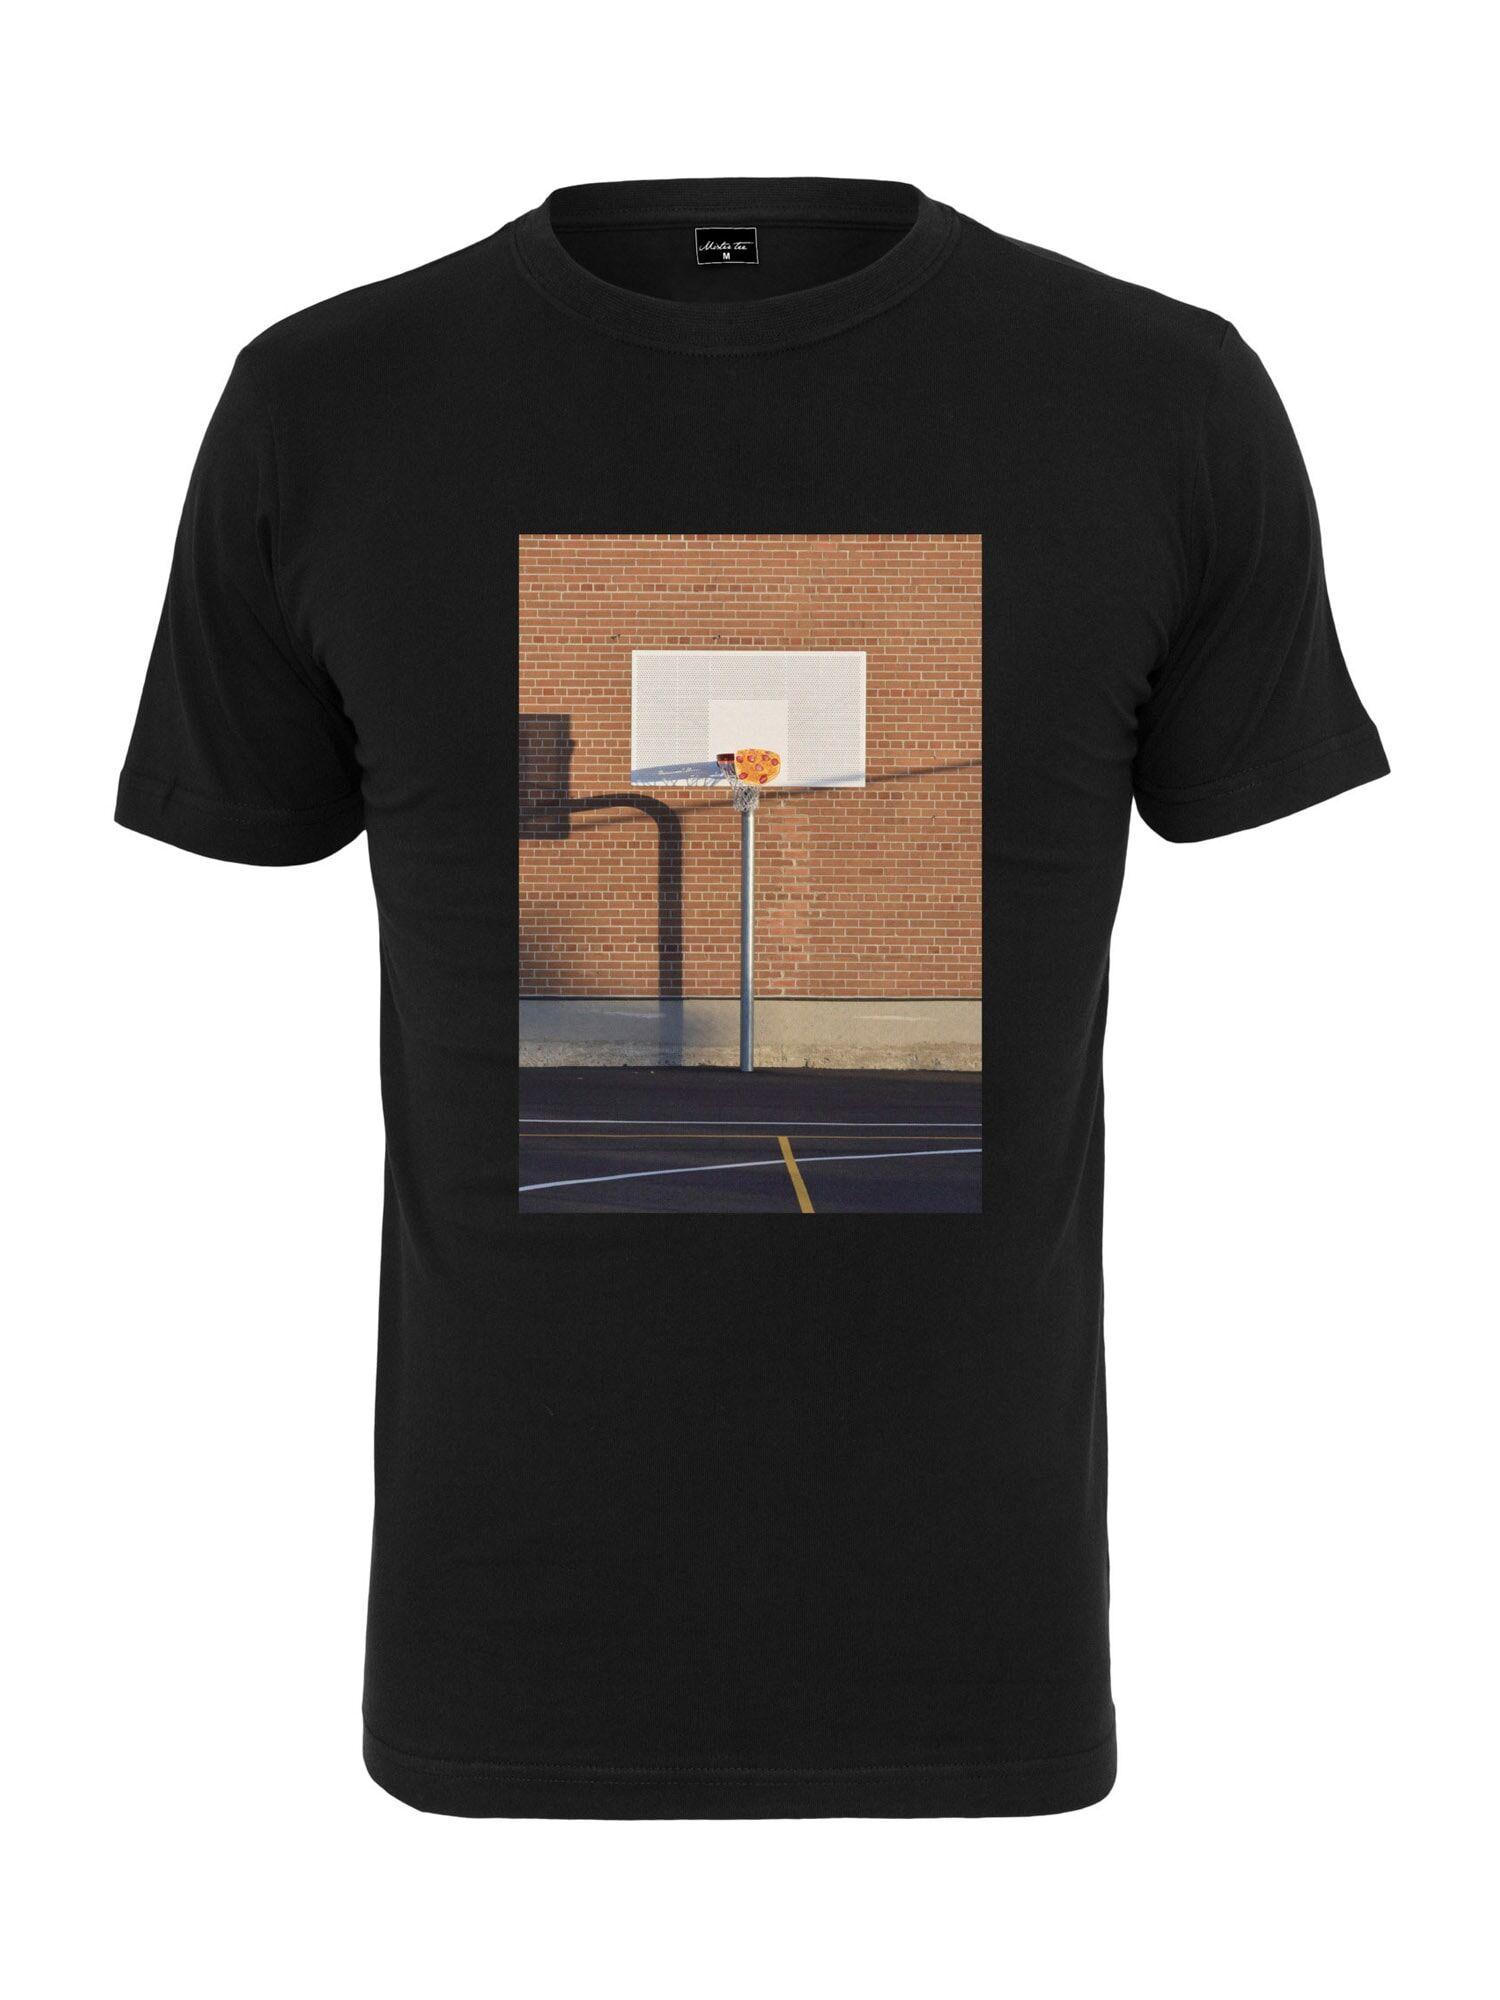 Tee T-Shirt 'Pizza Basketball Court'  - Noir - Taille: XL - male